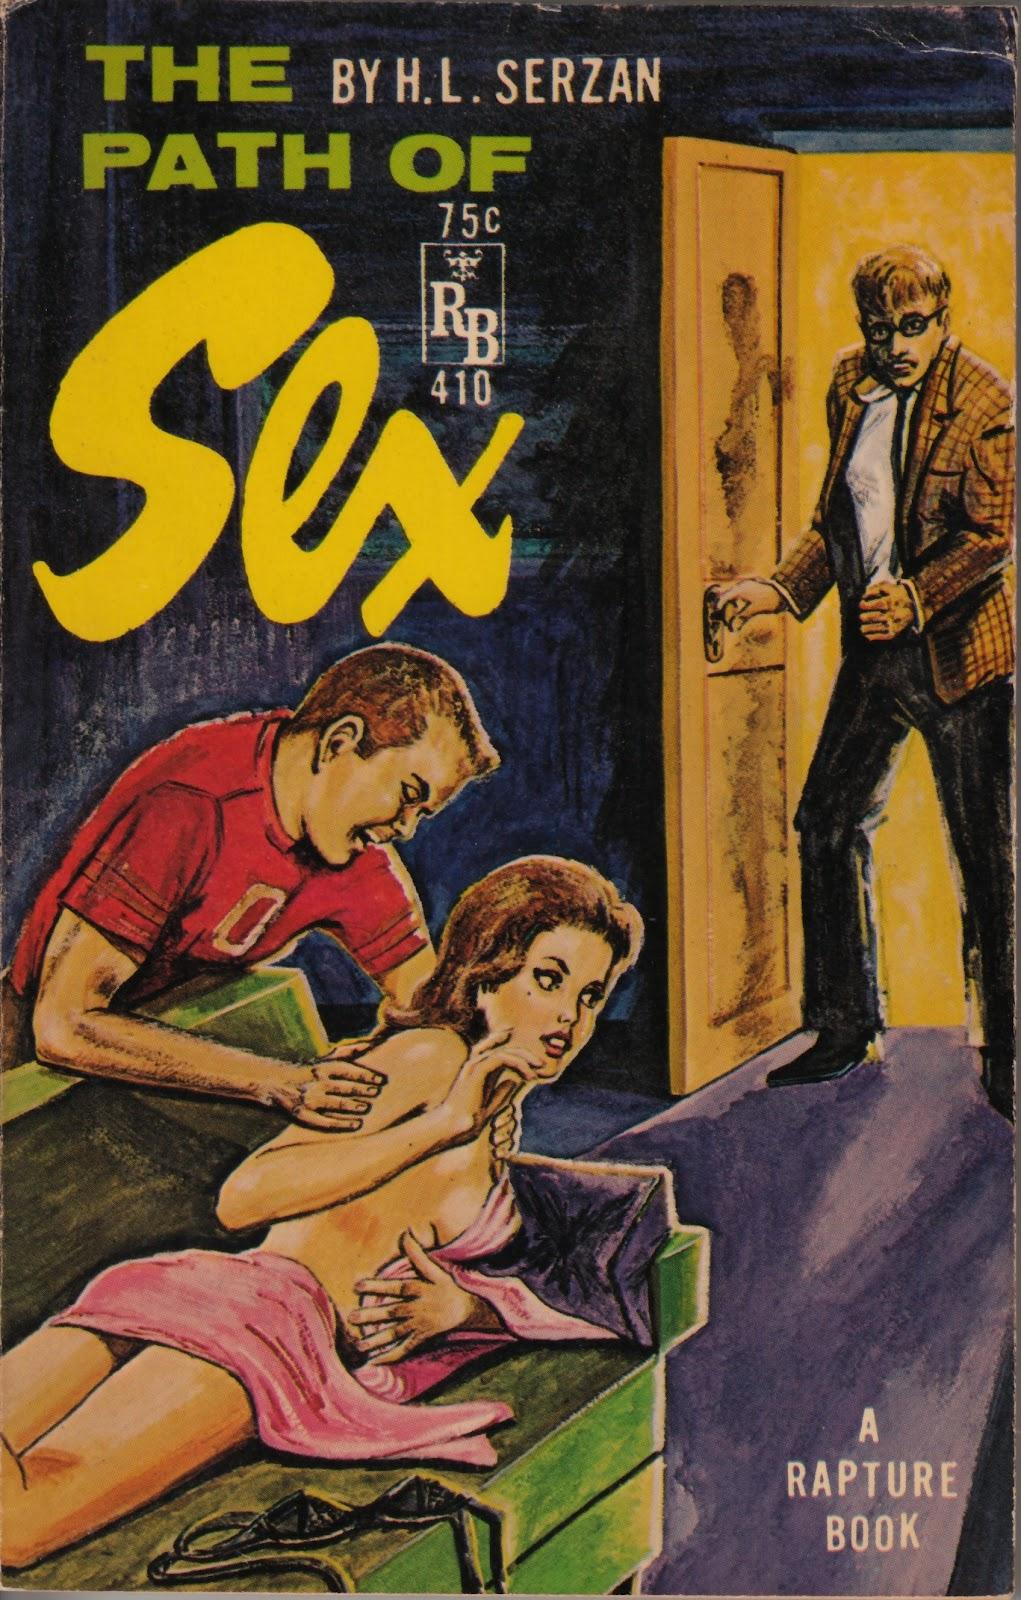 Seductive Cover Art